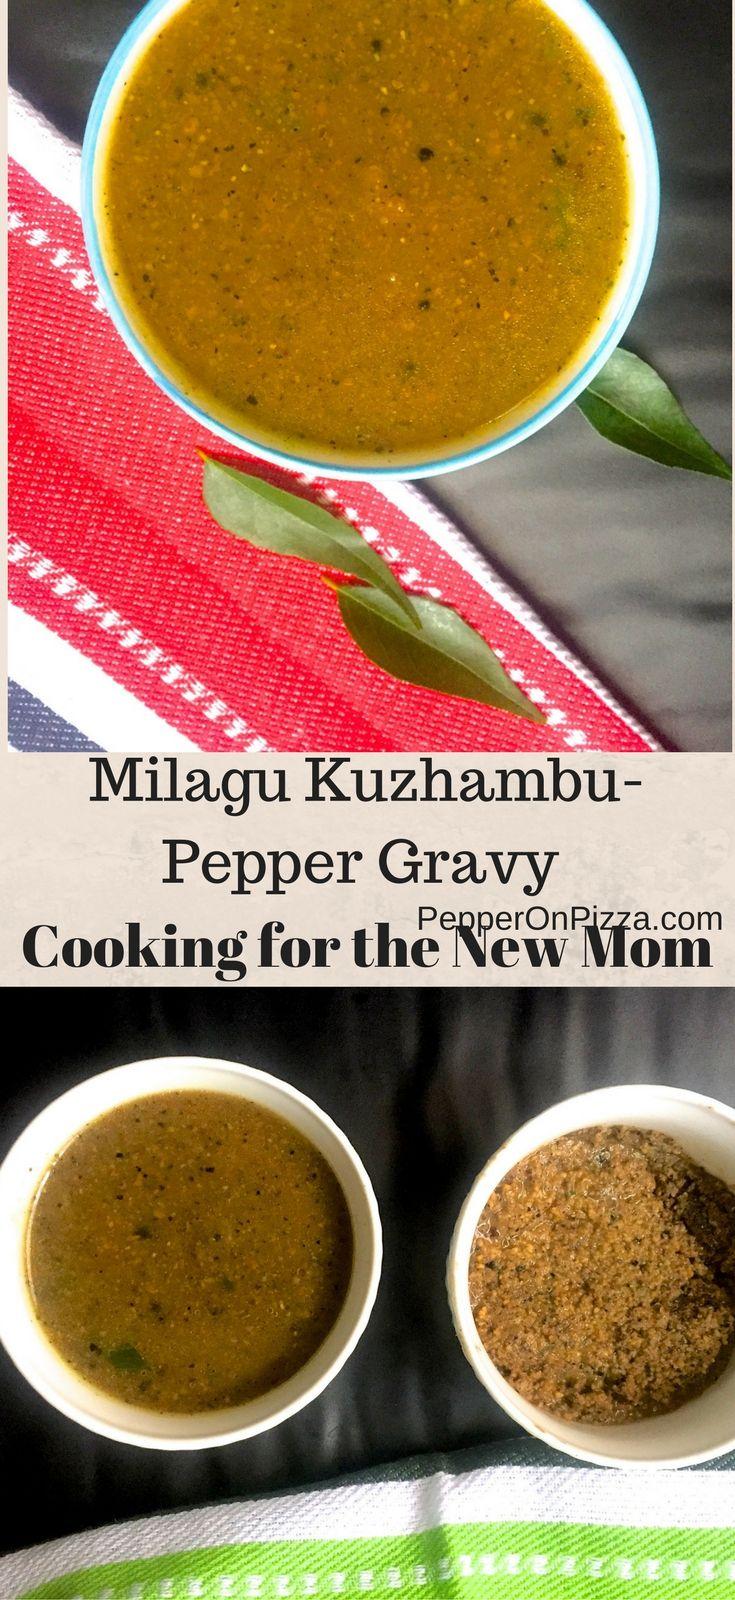 Pathiya milagu kuzhambu for the new mom recipe pepper gravy food forumfinder Choice Image